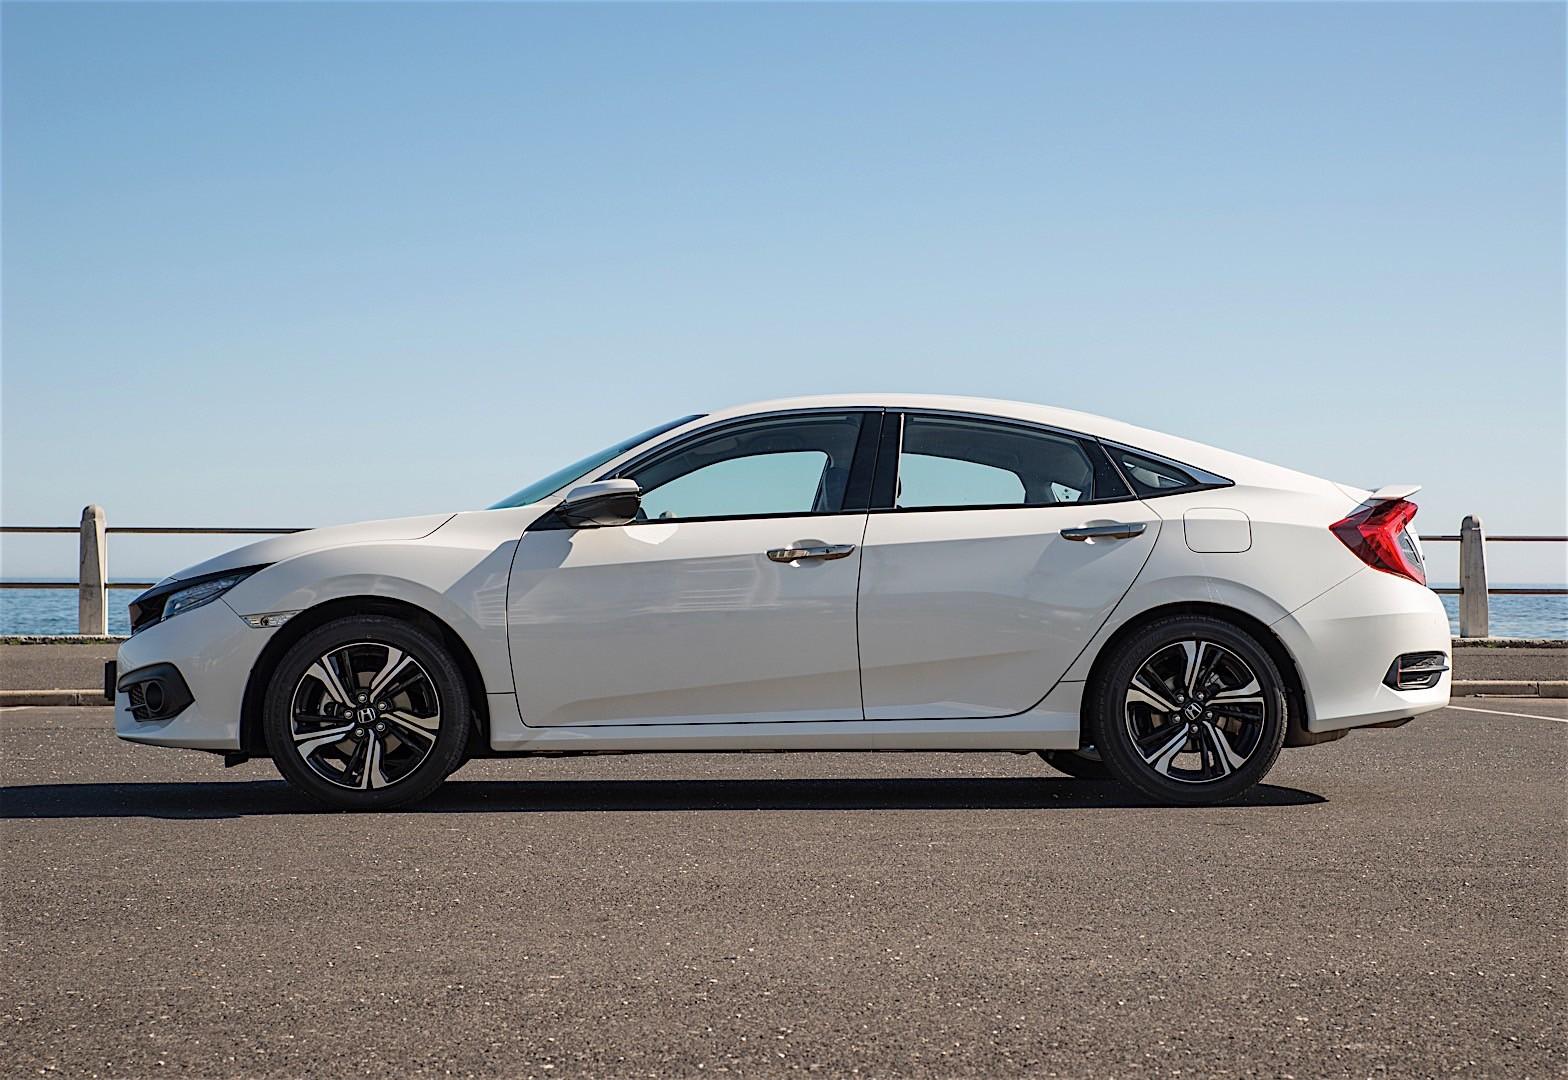 Honda civic sedan specs 2016 2017 2018 autoevolution for Honda civic 2016 dimensions